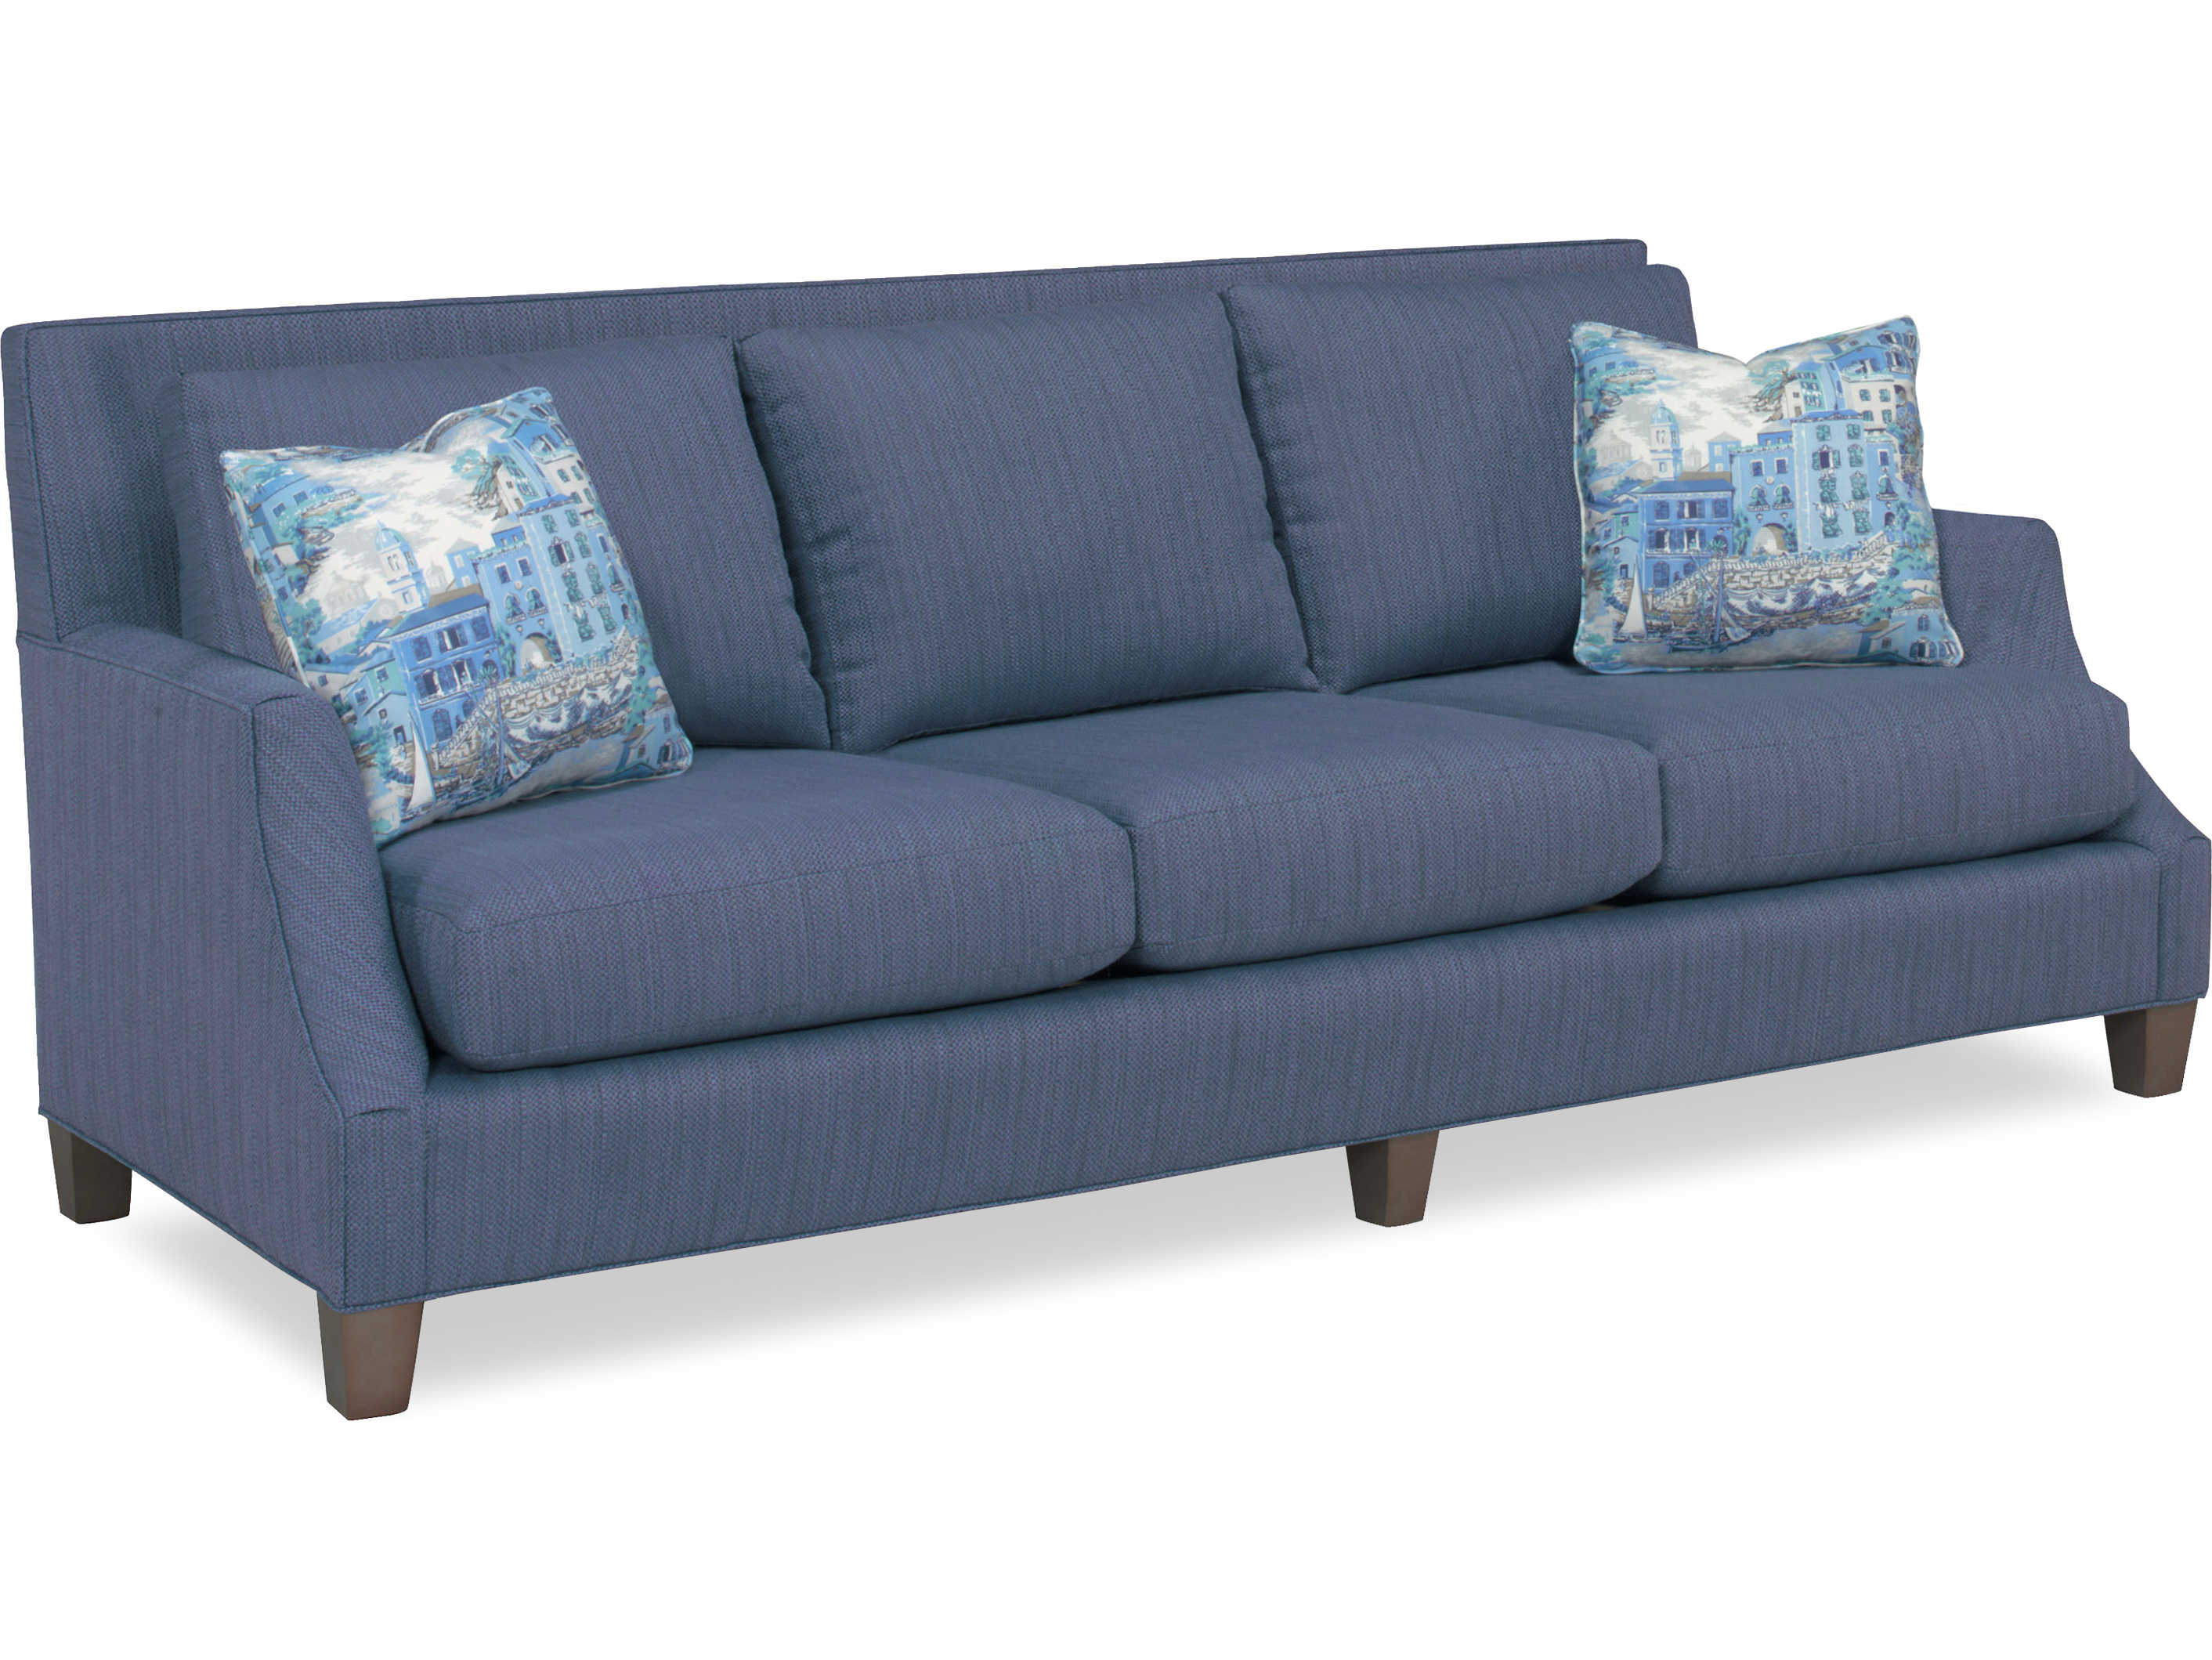 Temple Furniture Cadence 96 Wide Sofa